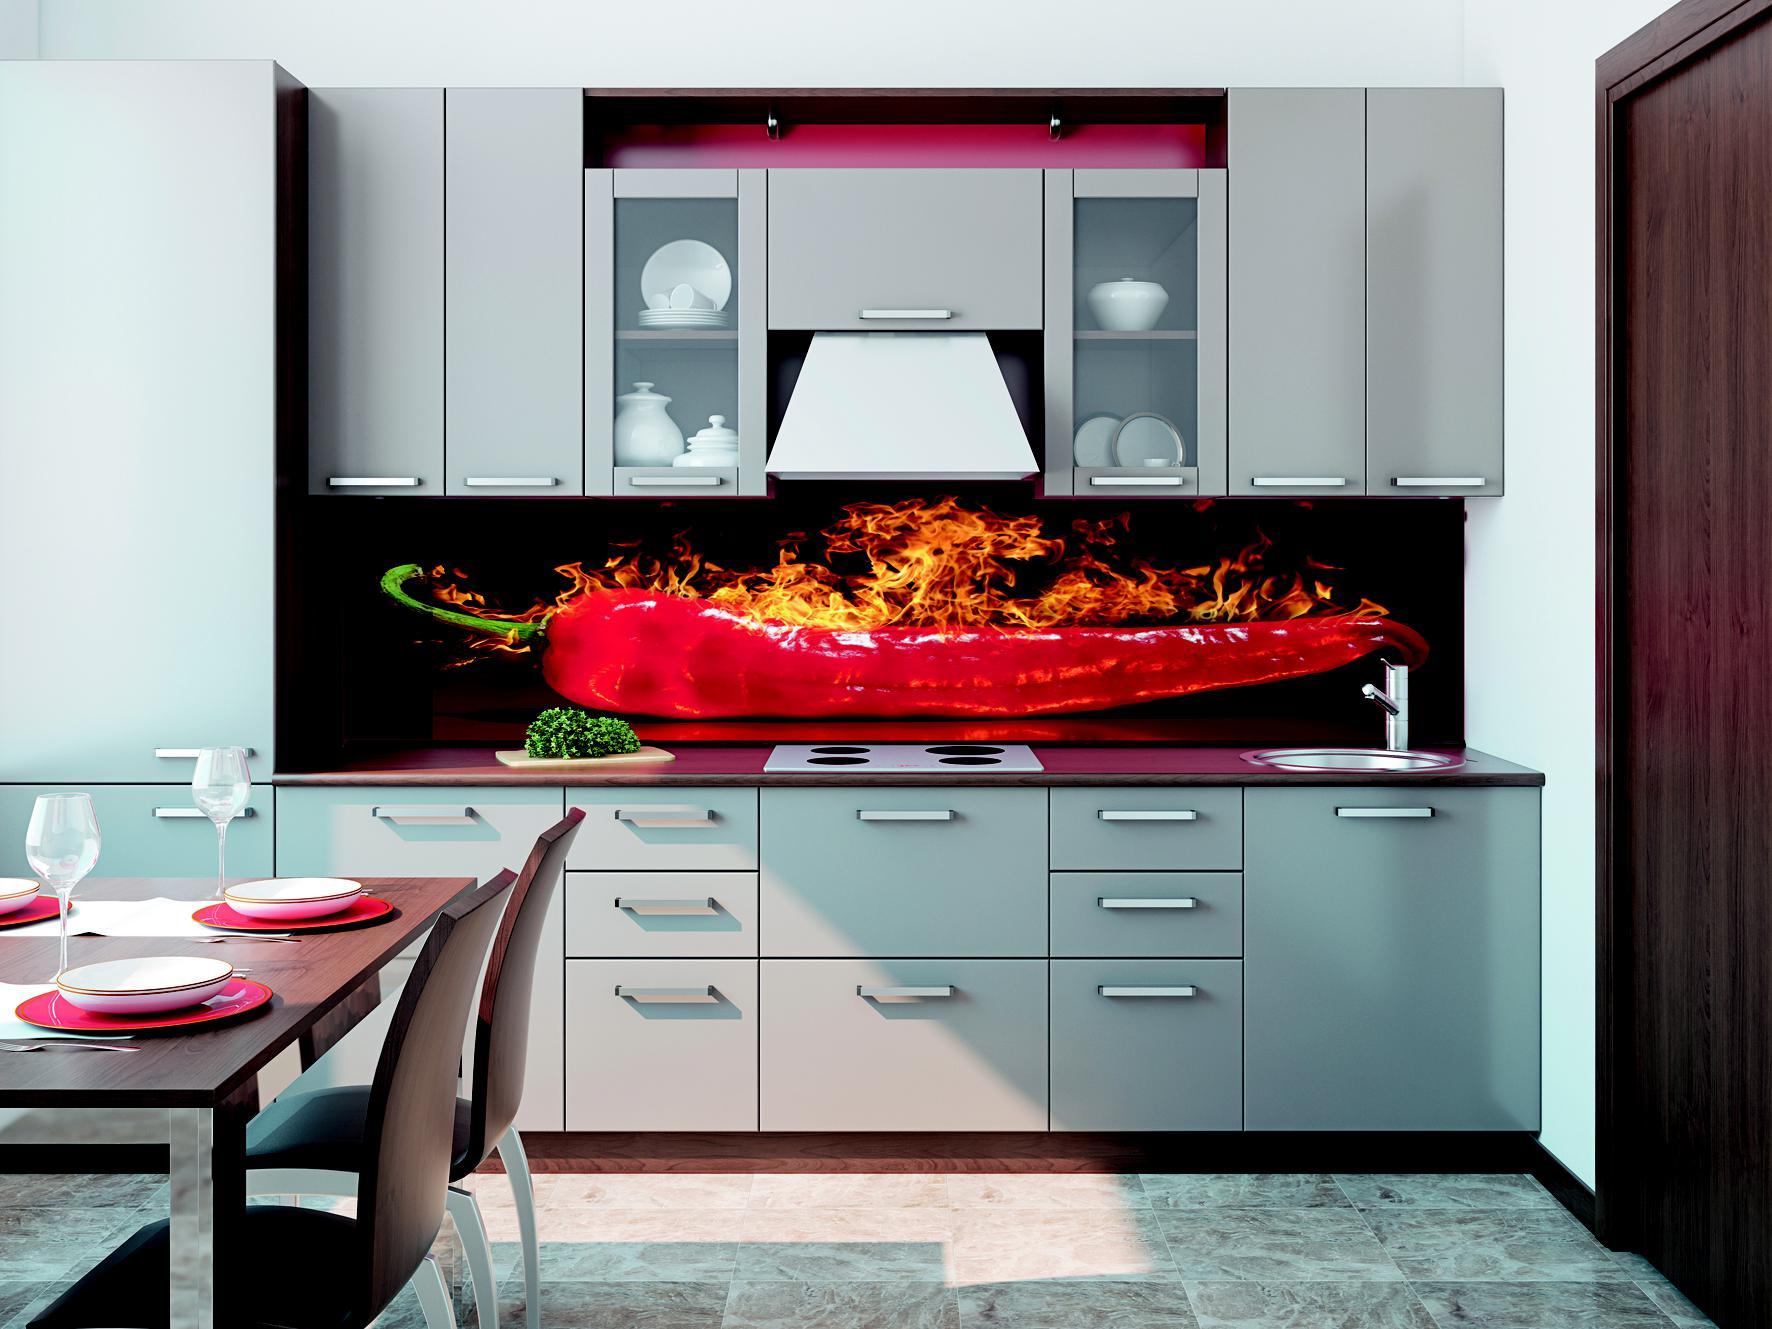 Anleitung Fachgerechte Befestigung Küchenrückwand Frag Mutti - Küche glasrückwand auf fliesen